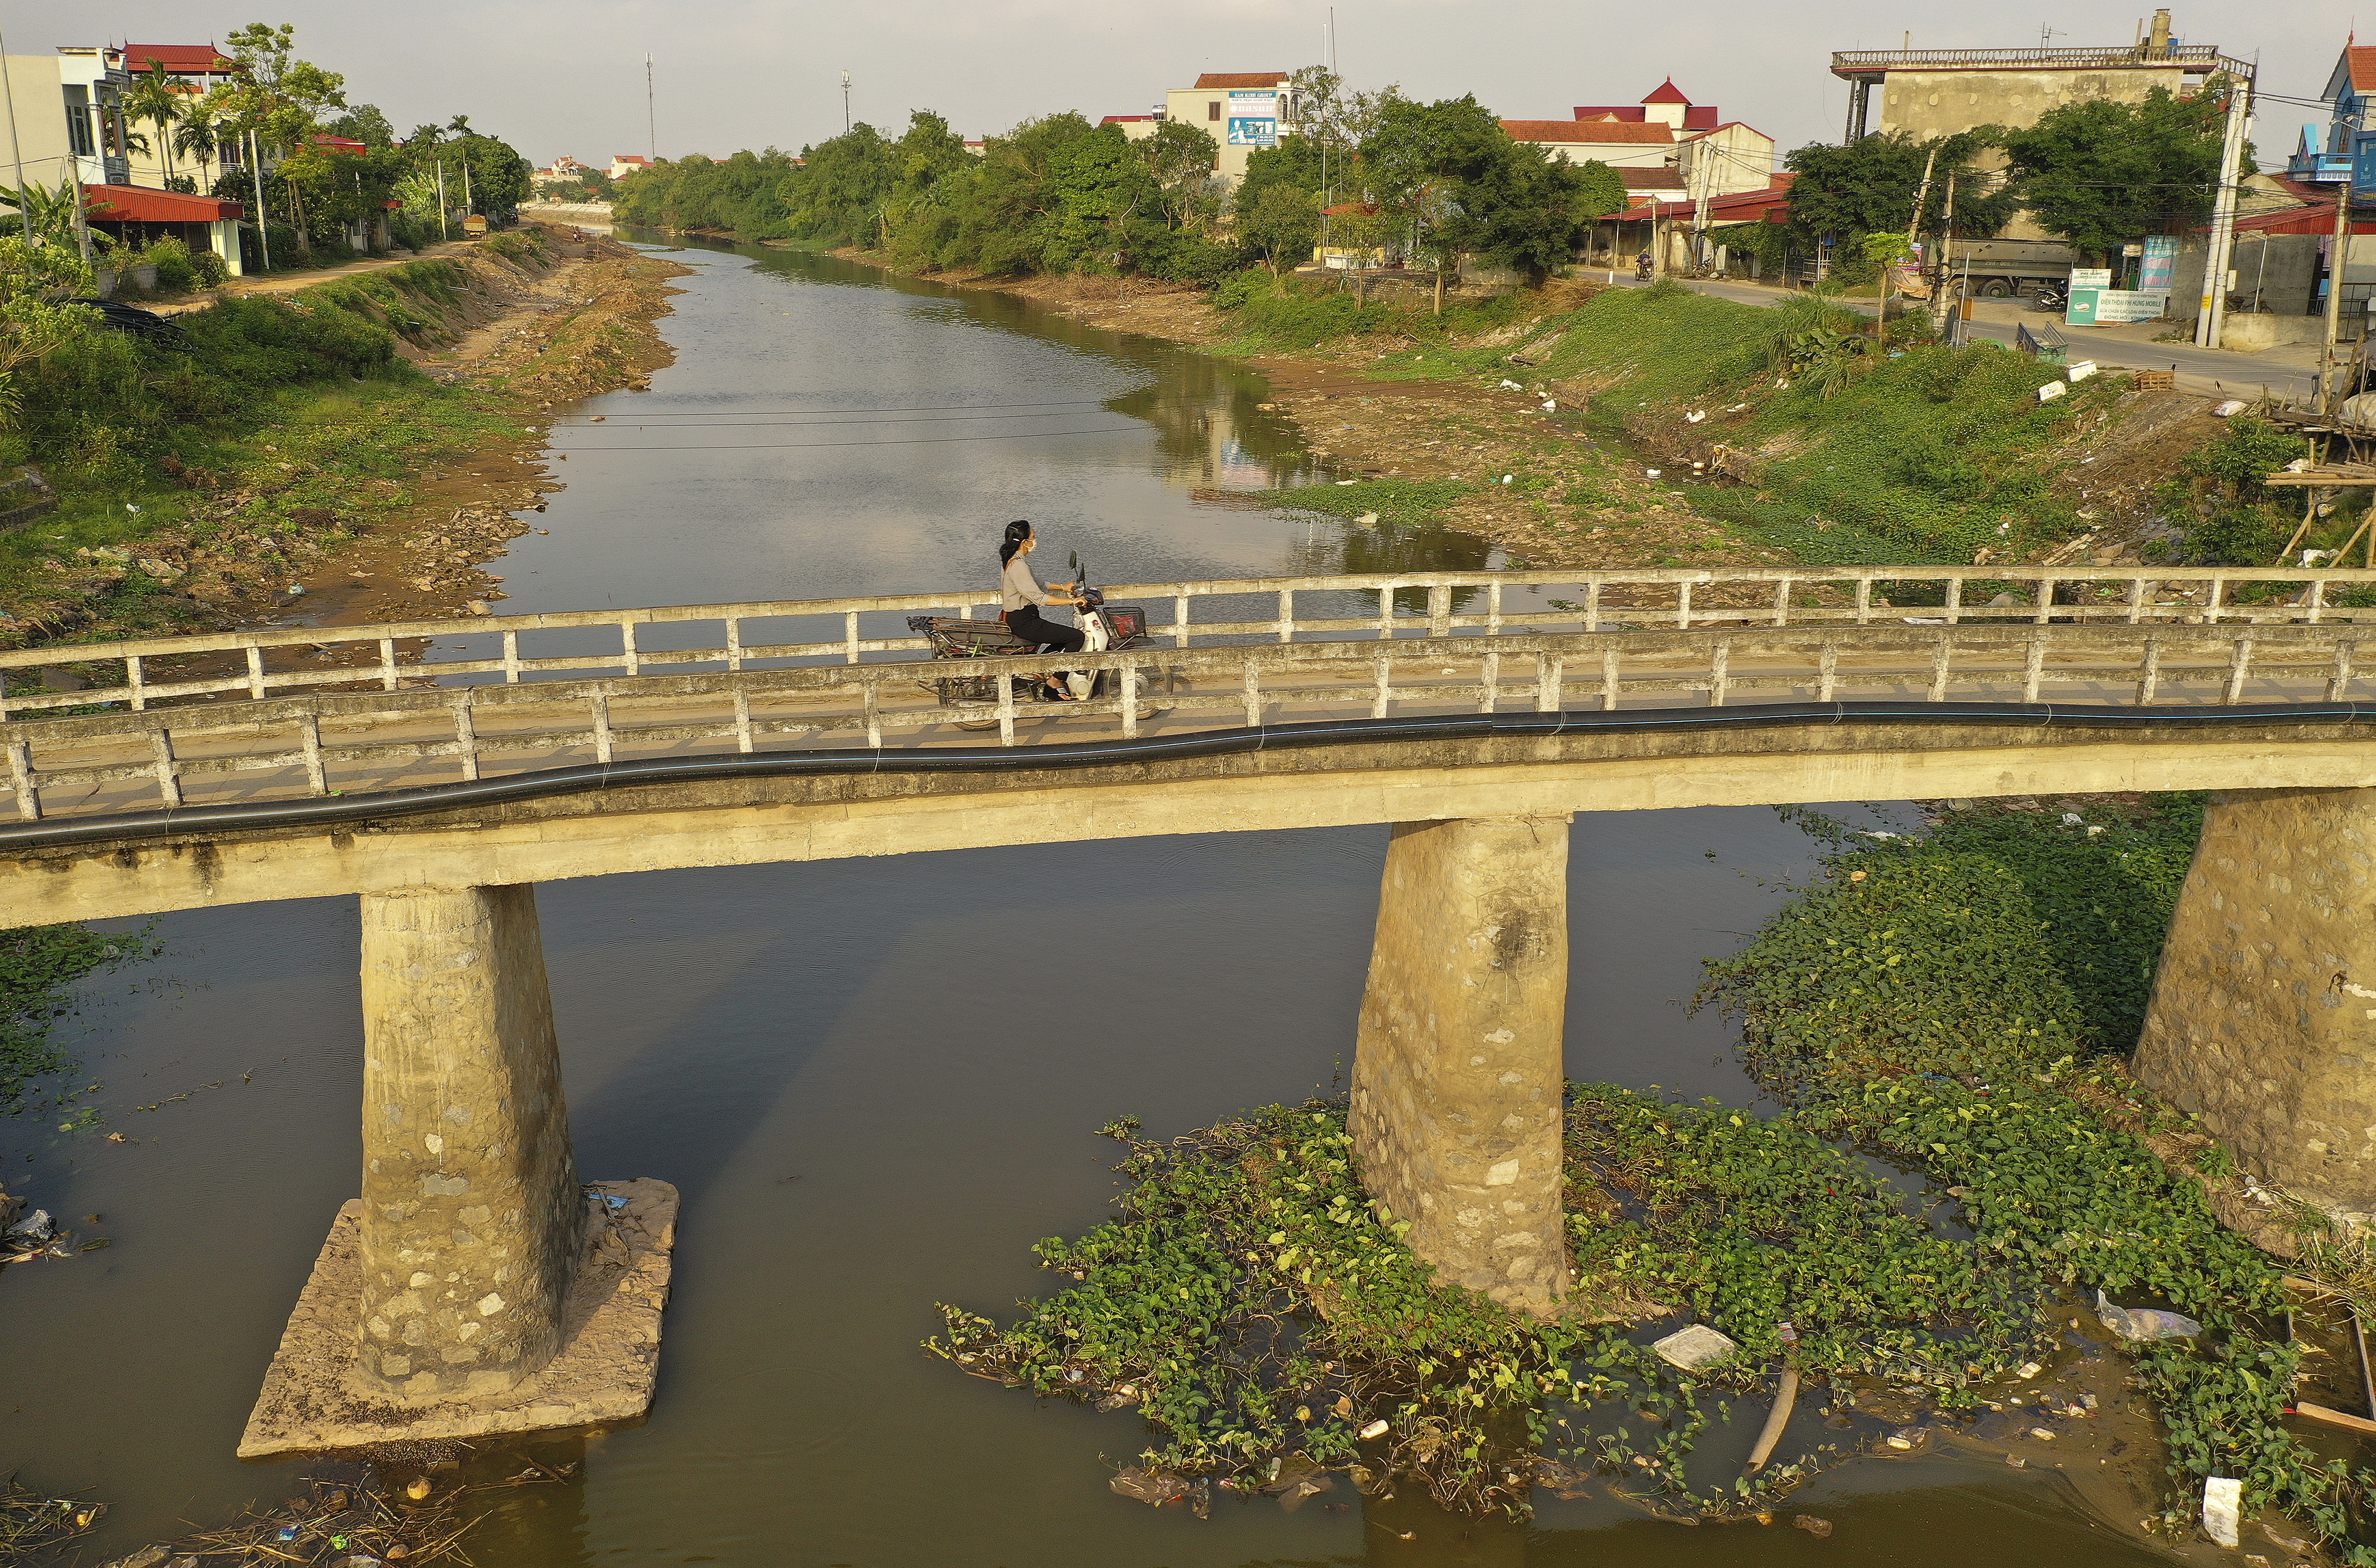 A motorist travels across a bridge in Hanoi, Vietnam, on Saturday, Nov. 16, 2019.